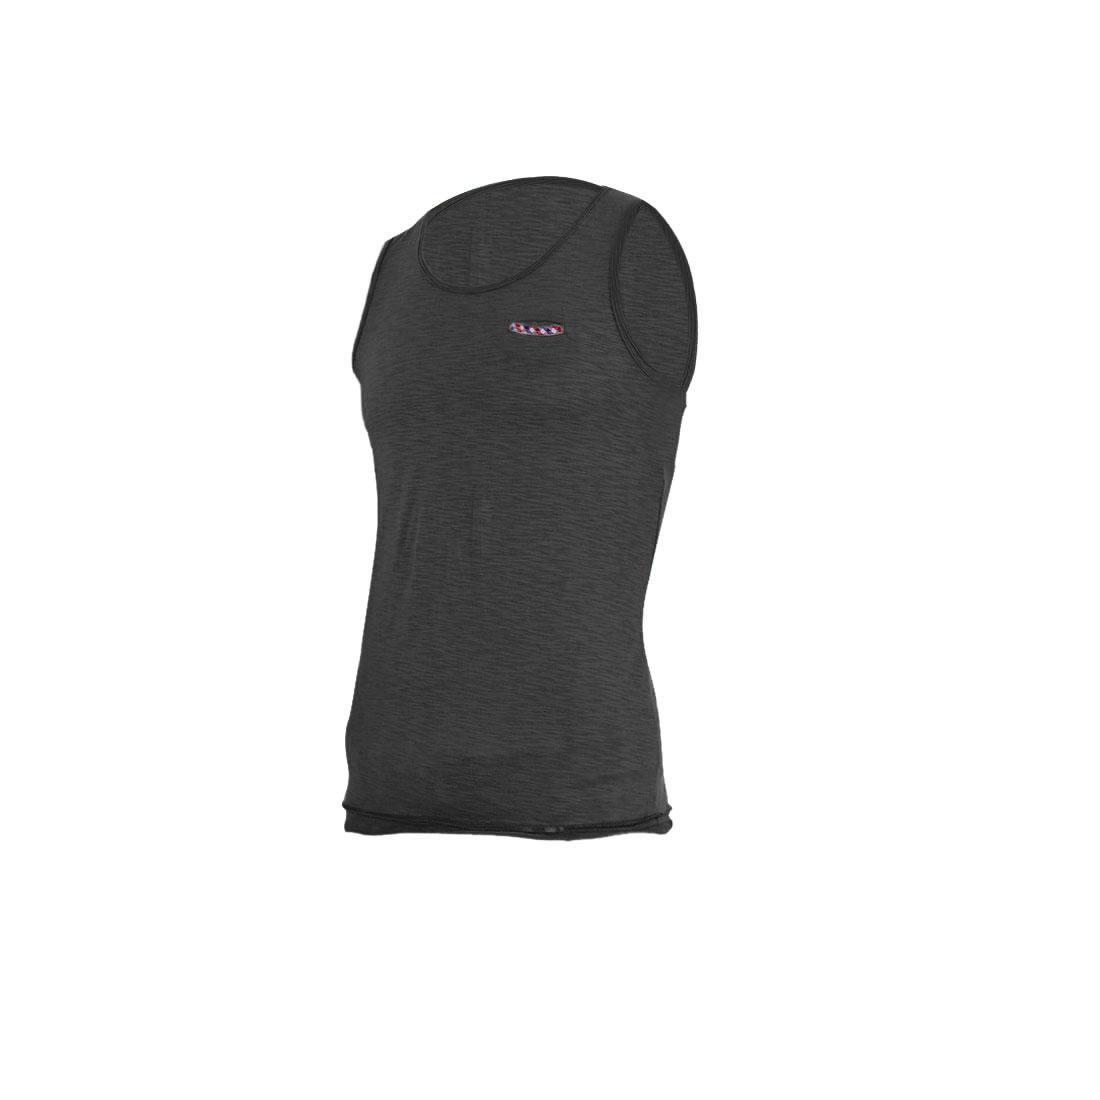 Men Pullover Design Straight Chest Pocket Front Tank Top Dark Gray S